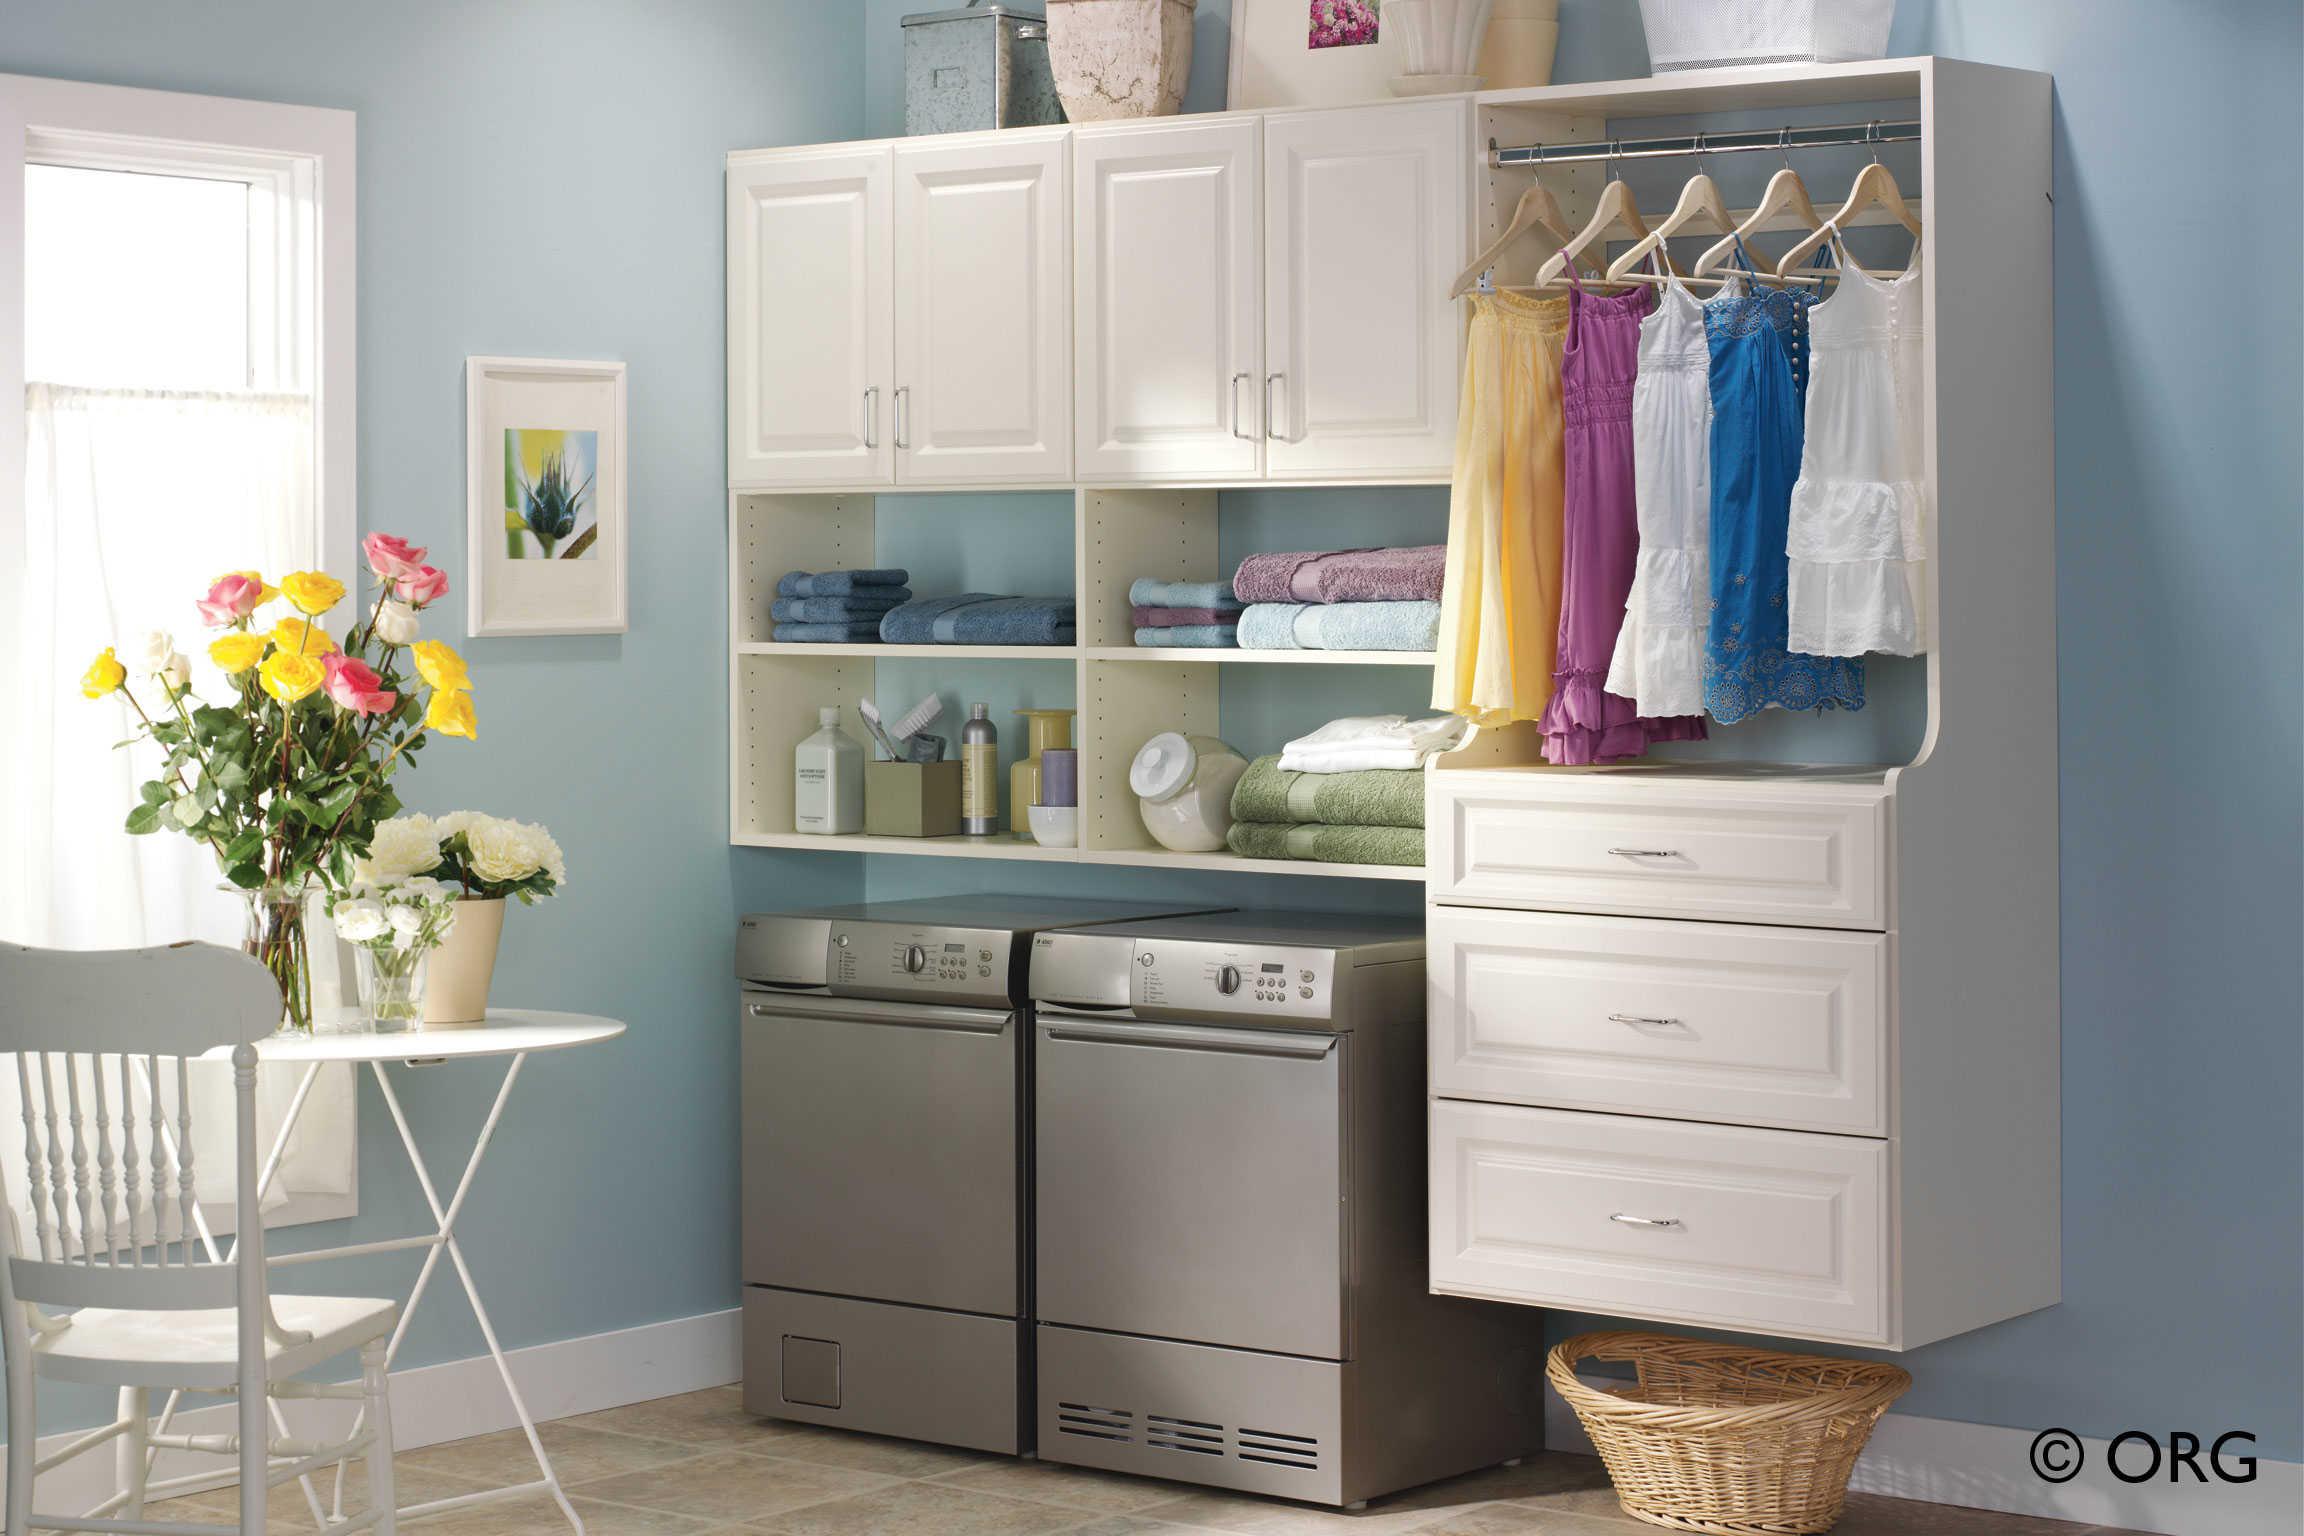 Custom Designed Closets Organized To Maximize Space